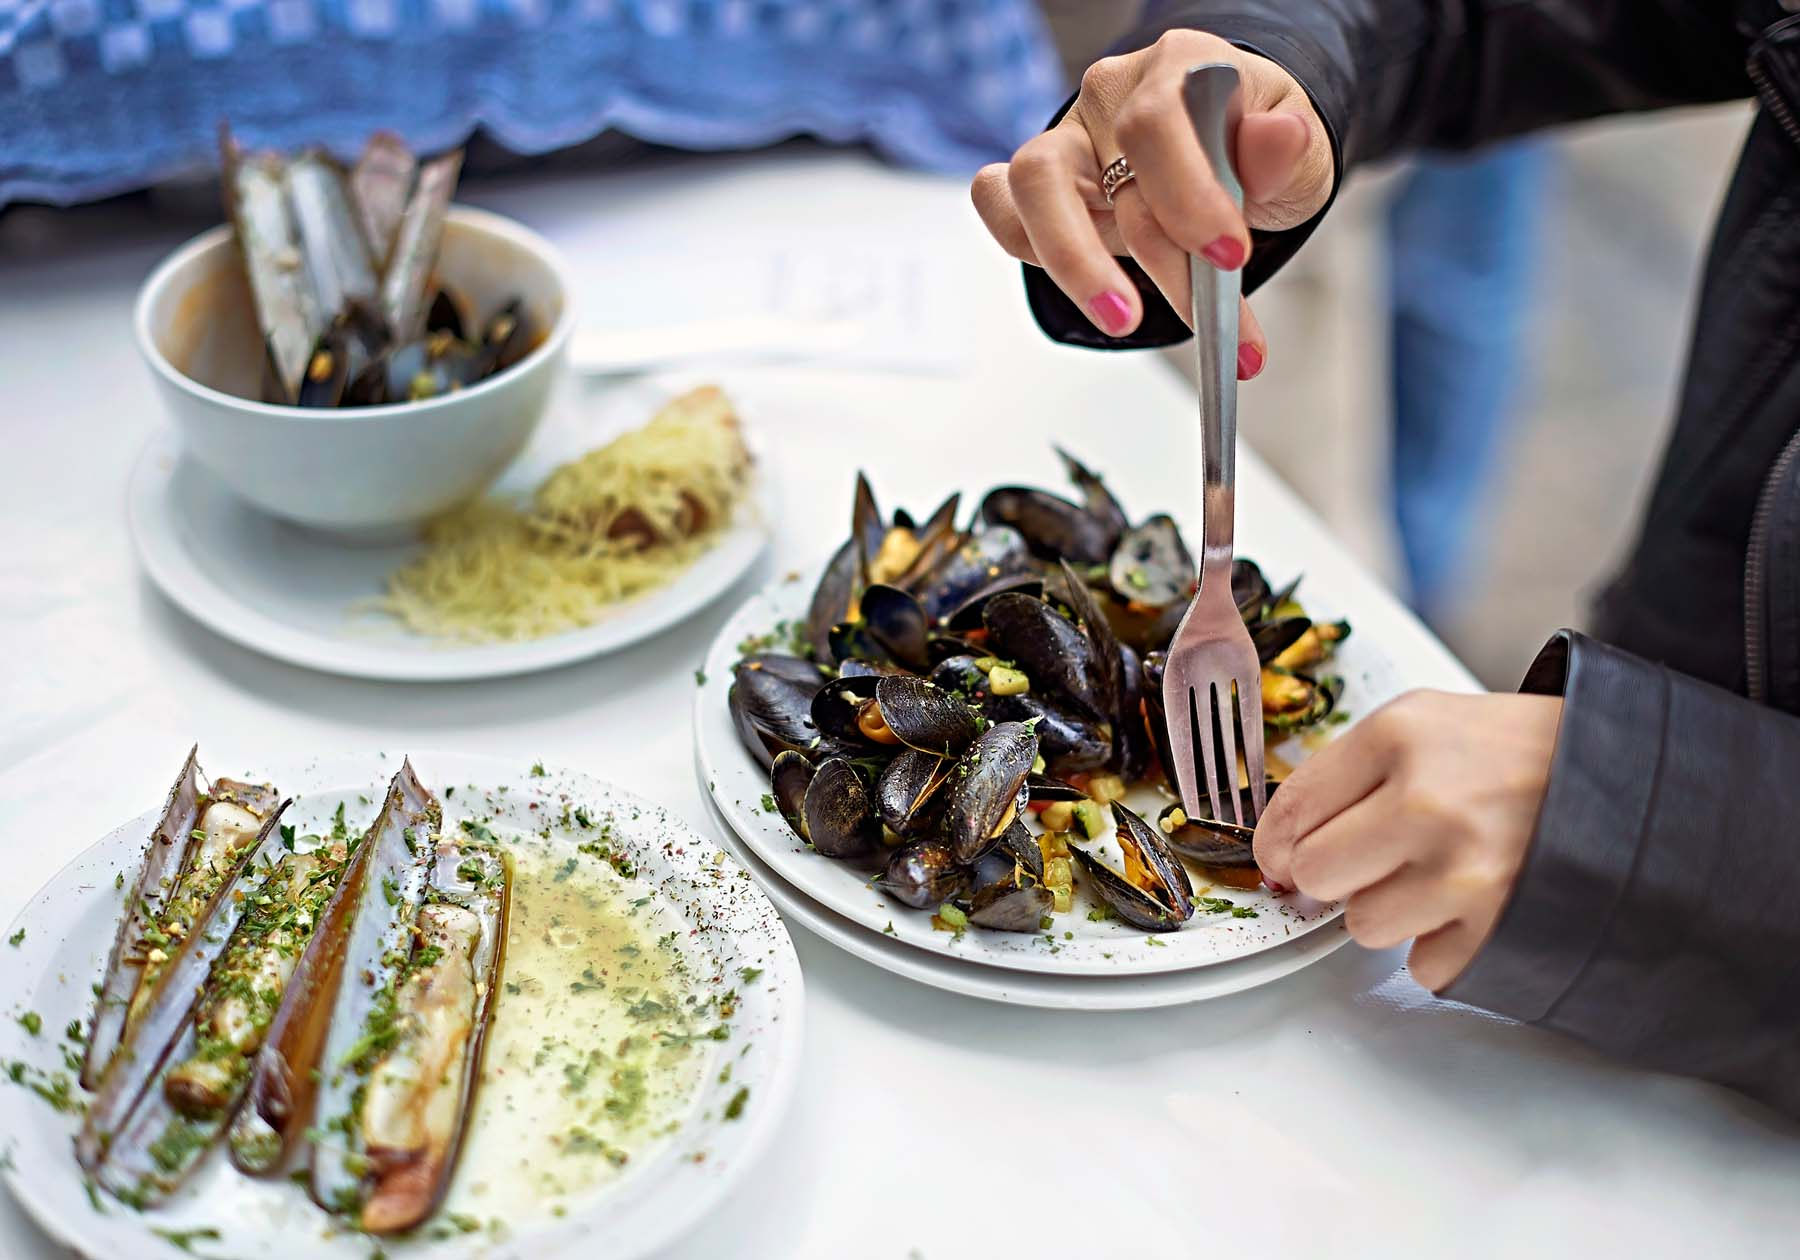 noordzee la mer du nord quality seafood in brussels and antwerp. Black Bedroom Furniture Sets. Home Design Ideas